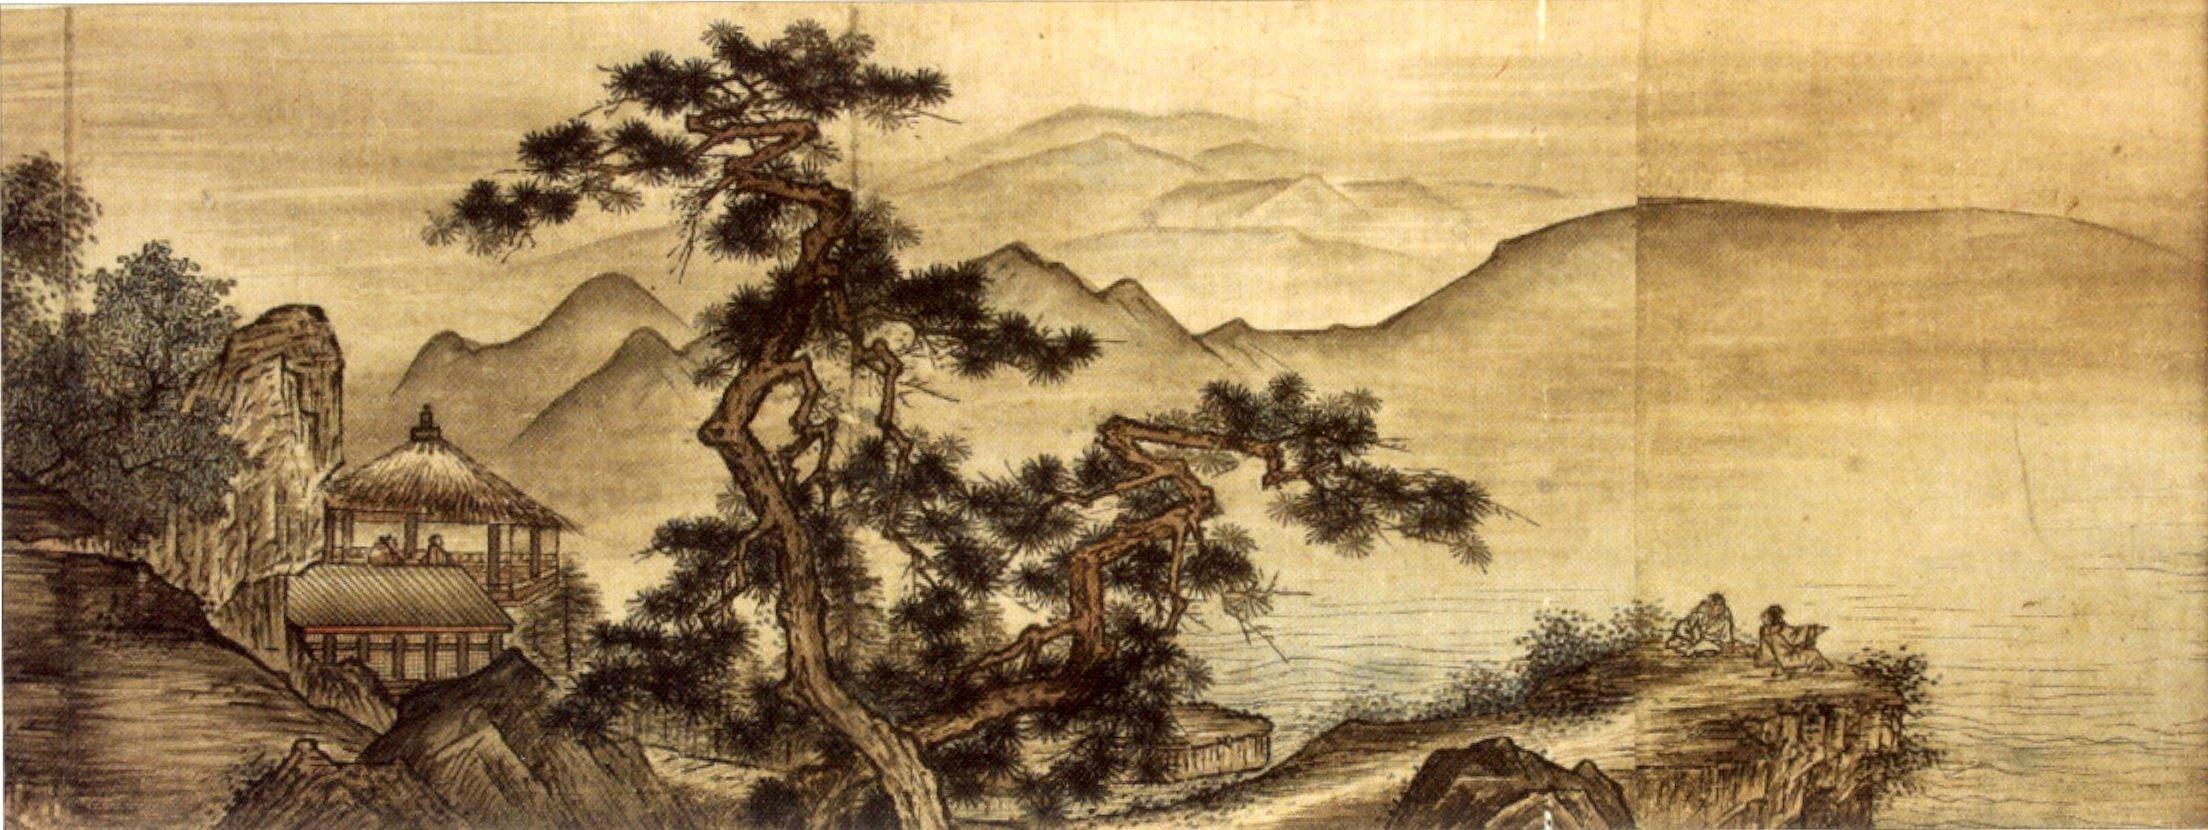 Resultado de imagen de dibujo paisaje chino